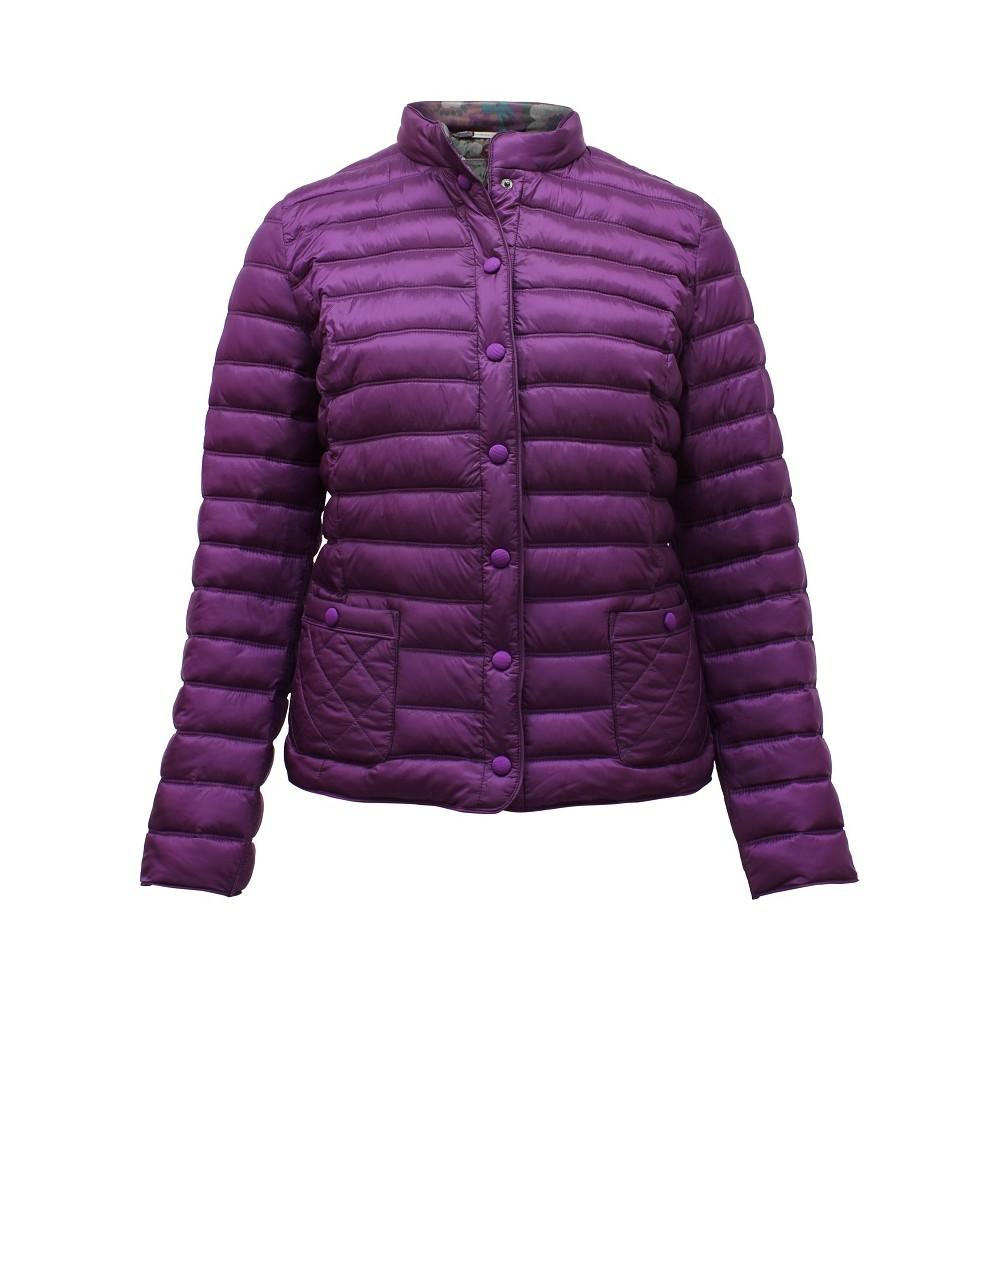 Barbara Lebek Reversible Quilted Jacket|Jackets and Gilets|Irish Handcrafts -1